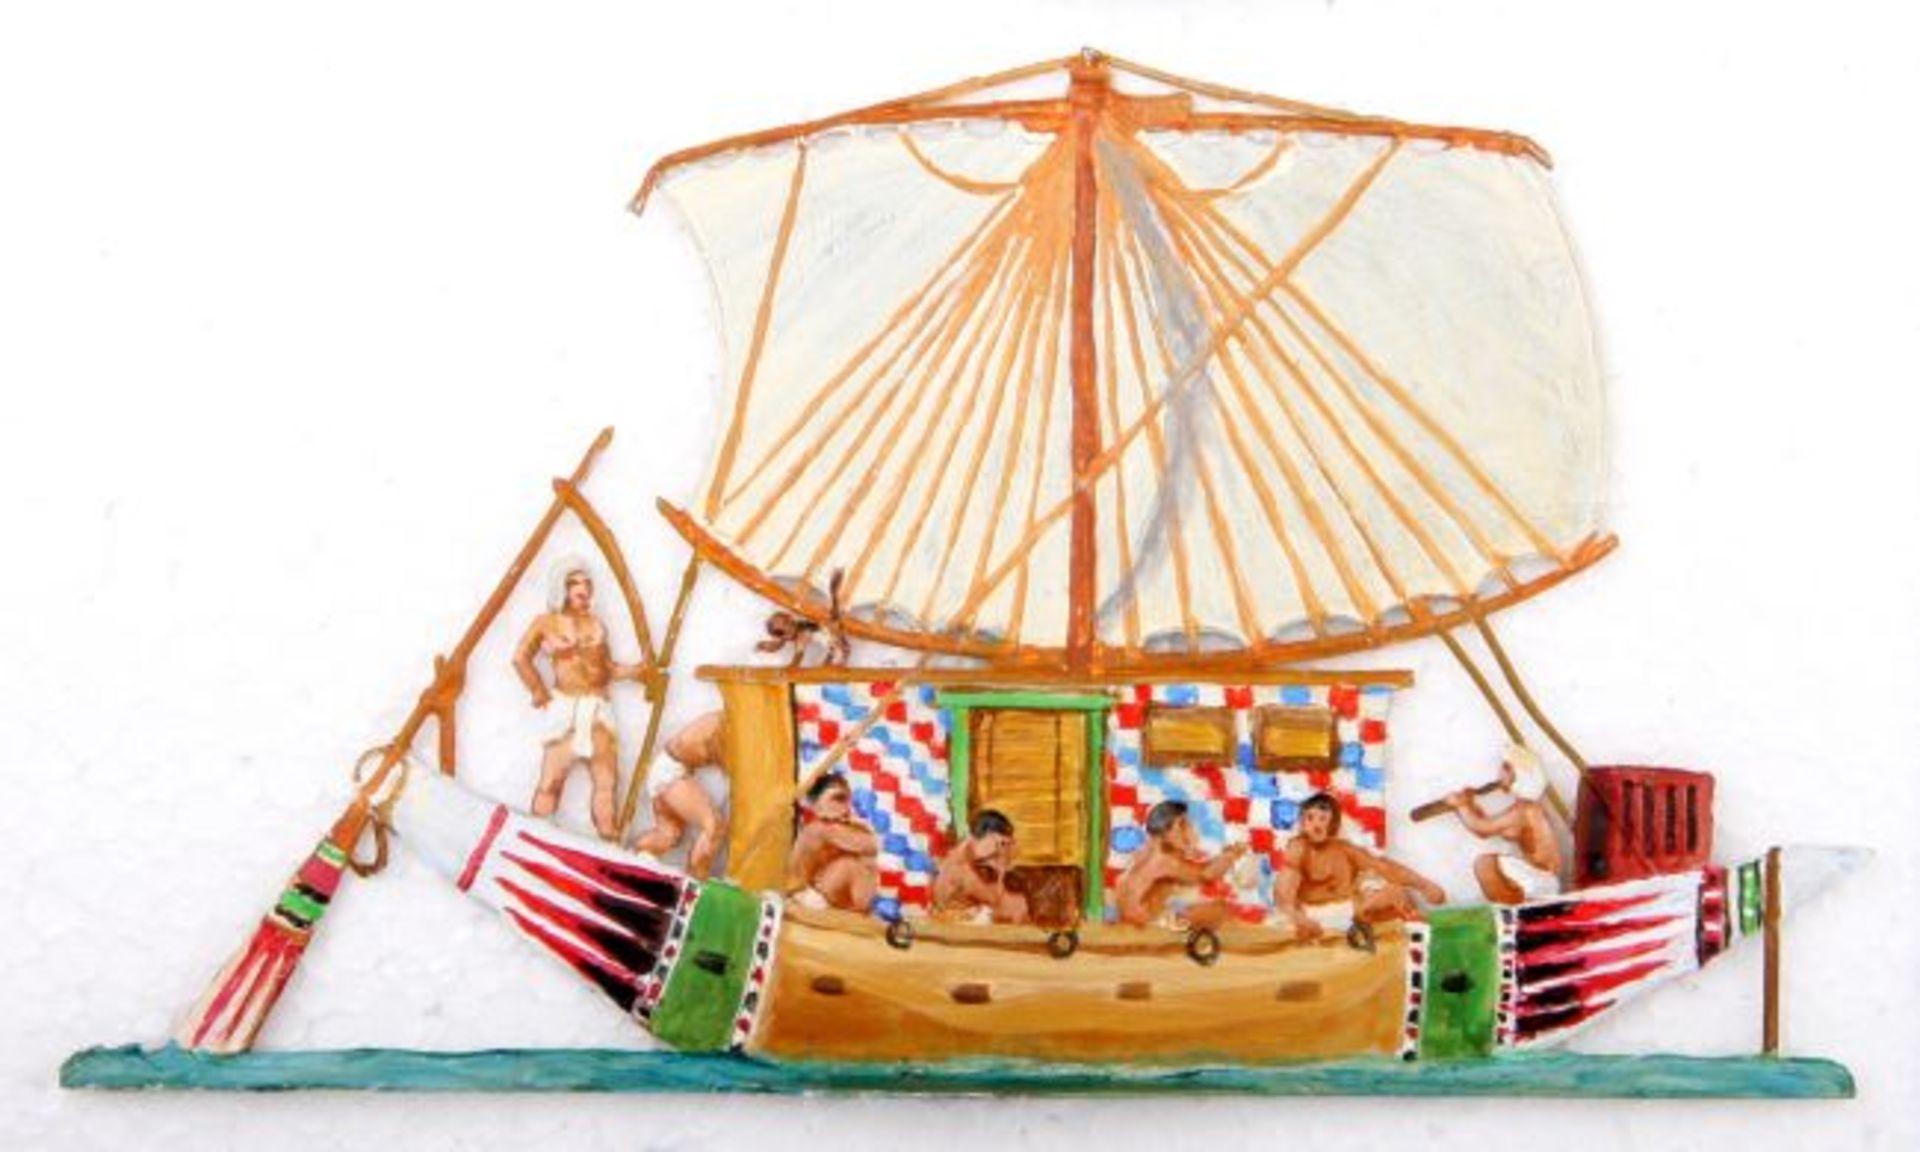 Altertum, Ägypten, Nil-Barke unter Segel, Höhe ca. 10 cm, Tylinski, gute, schattierte Bemalung, 1